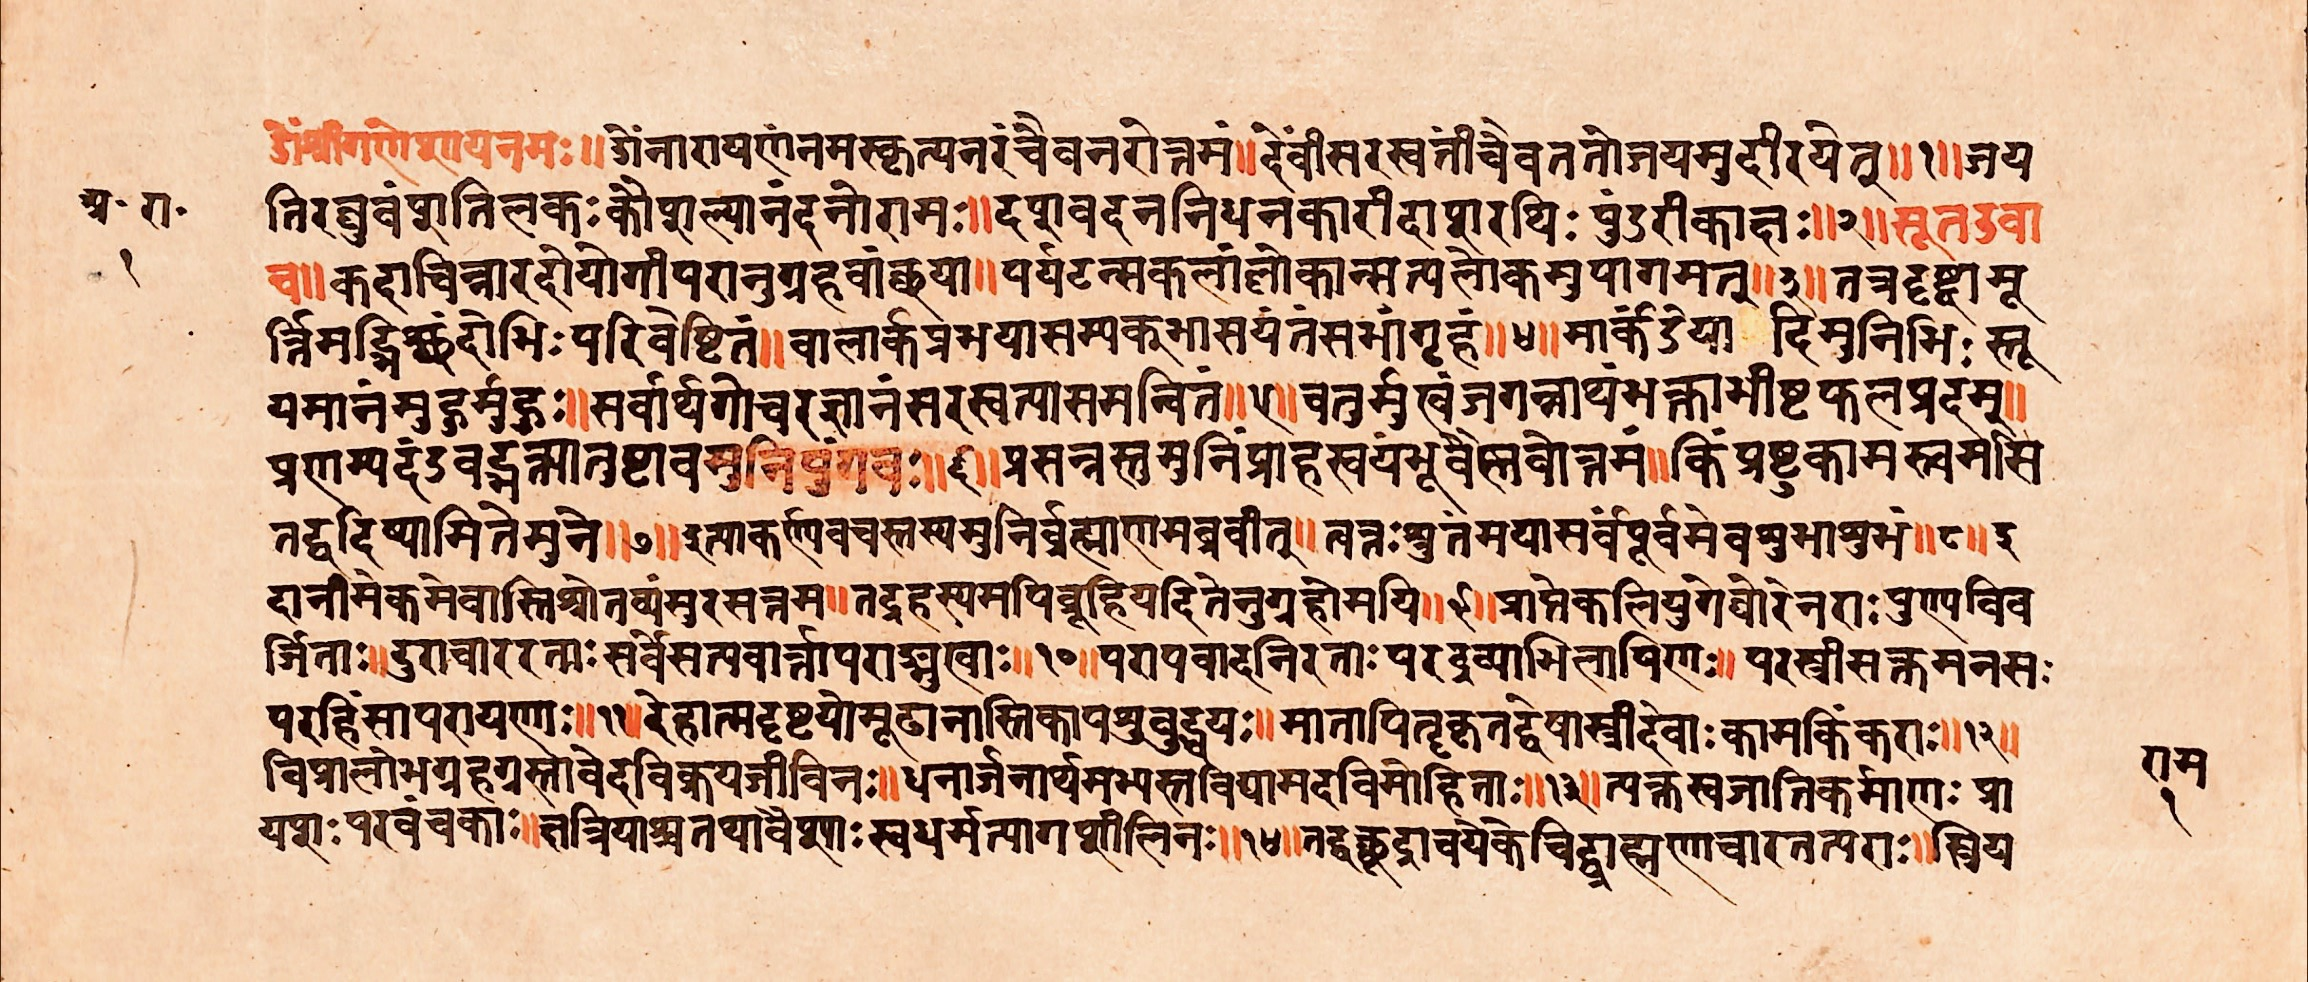 Adhyatma Ramayana - Wikipedia